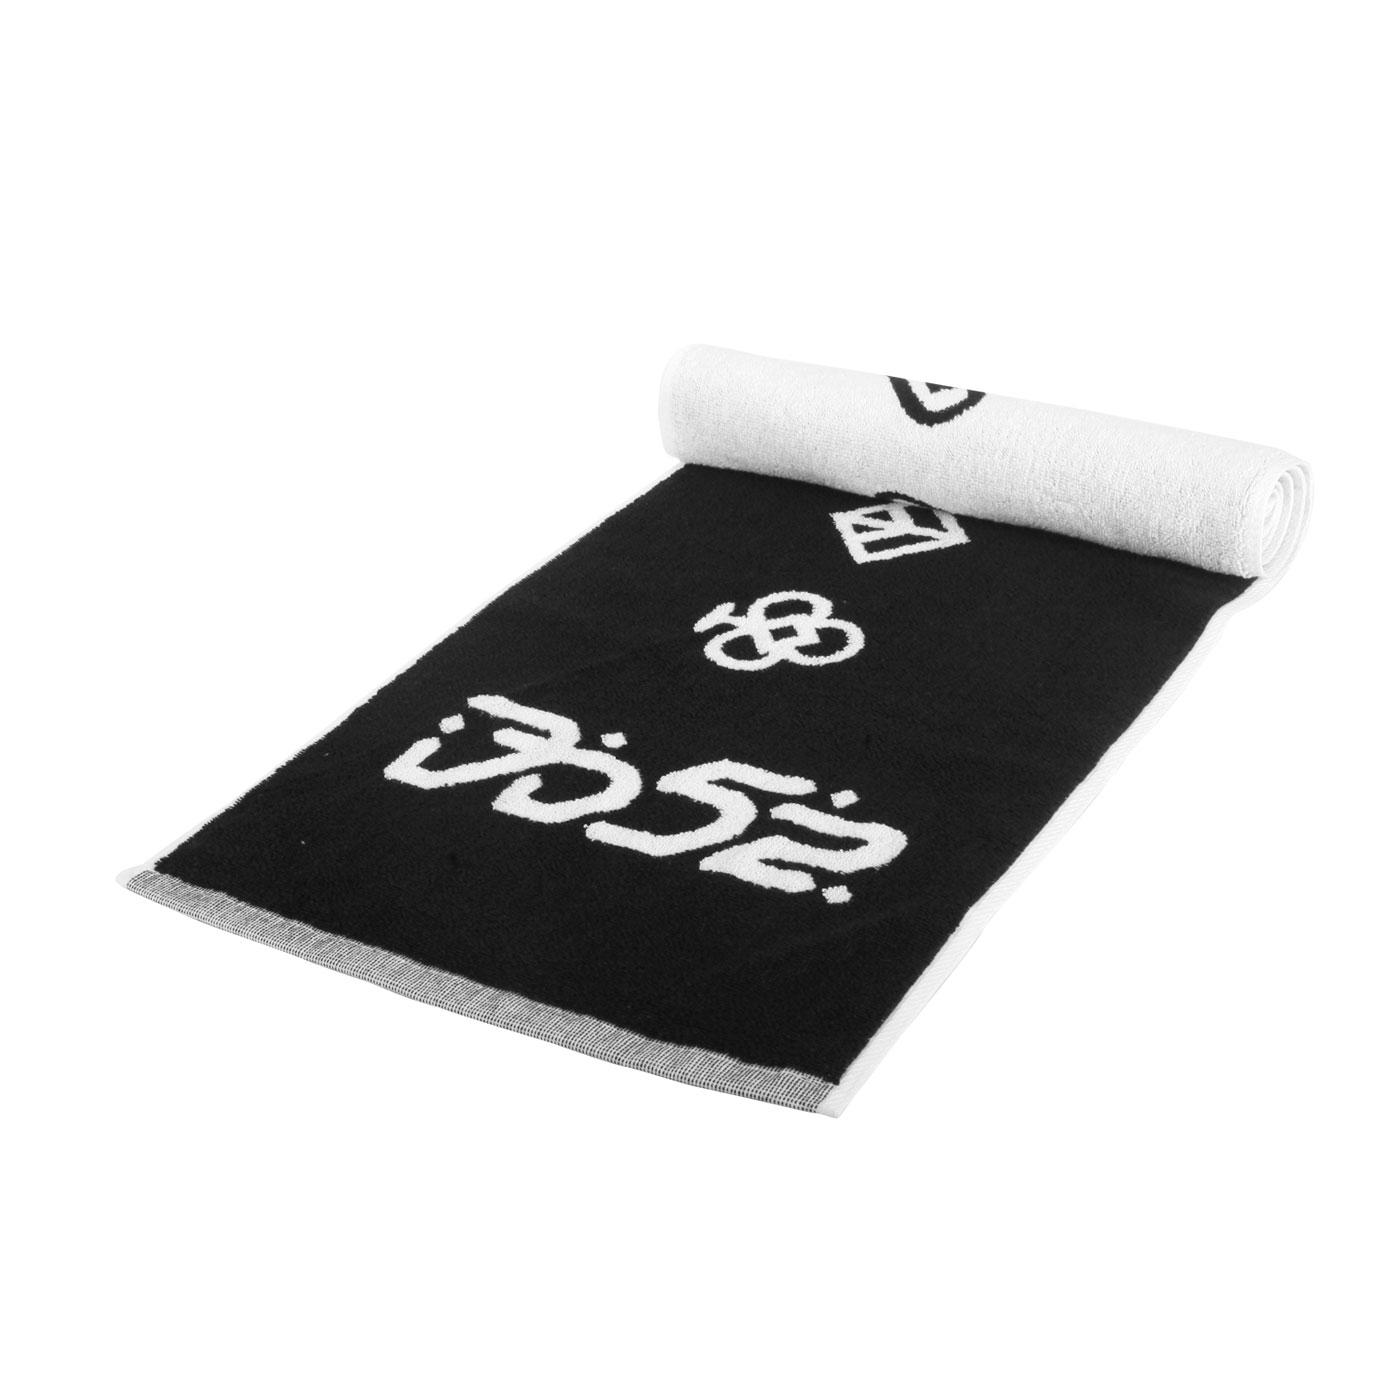 KAPPA DD52聯名毛巾 37137ZW-005